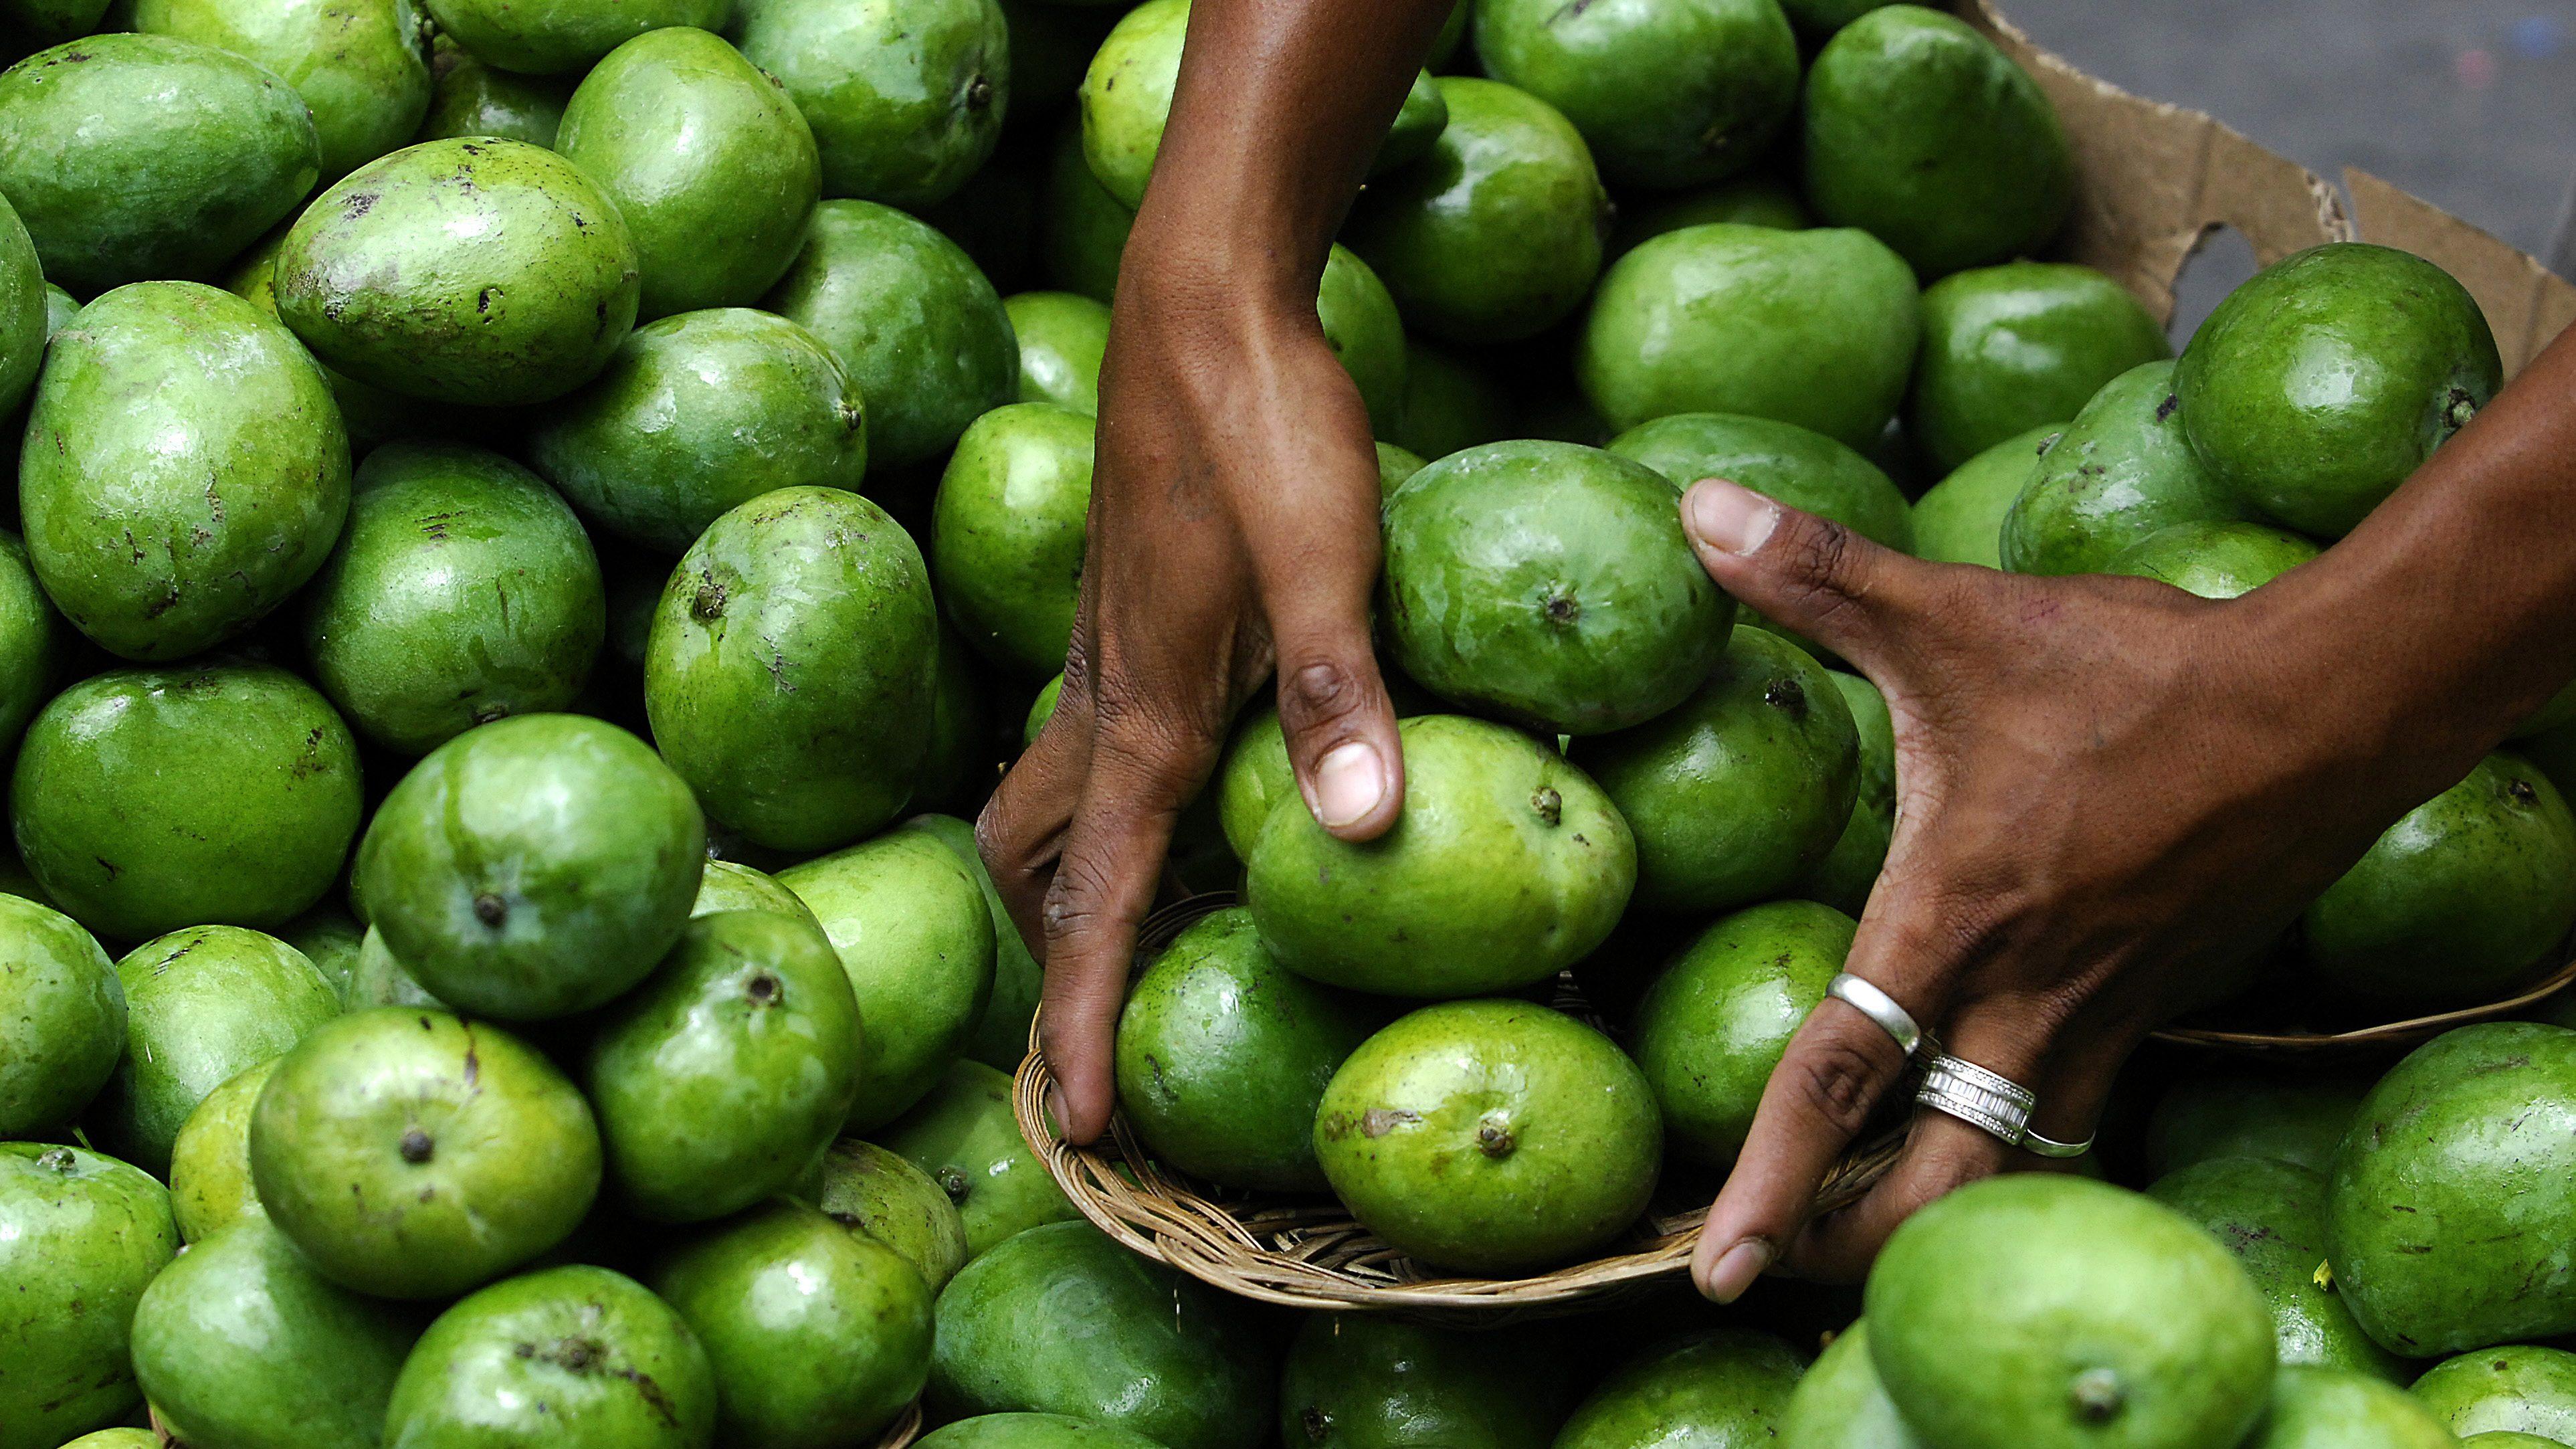 How Philippines Plans To Sell Mango Bumper Crop Quartz